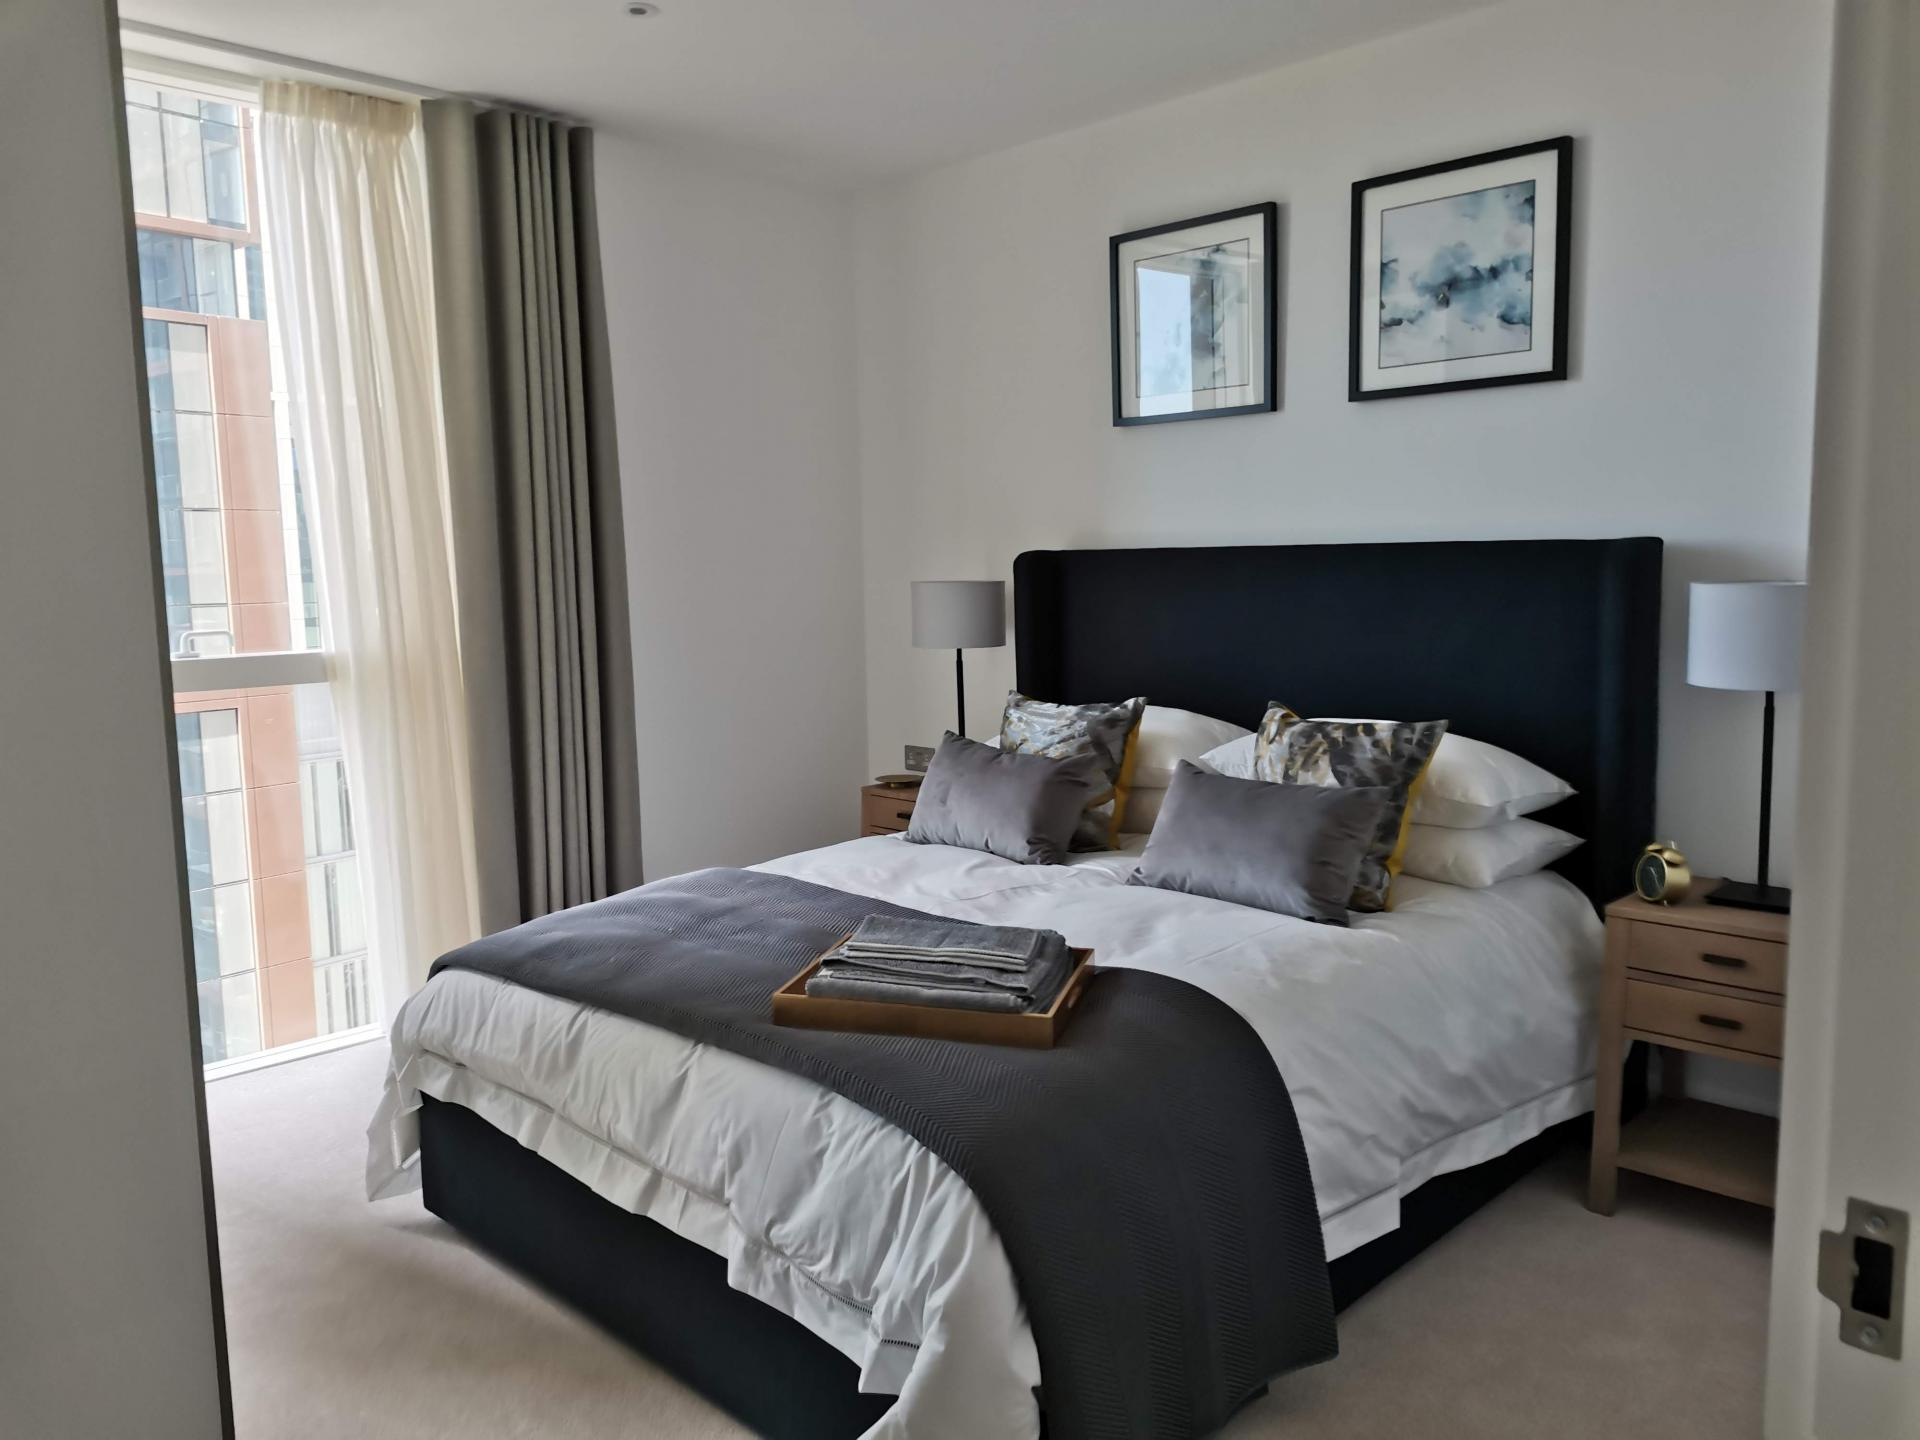 Bedroom at Charles Hope Canary Wharf, Canary Wharf, London - Citybase Apartments